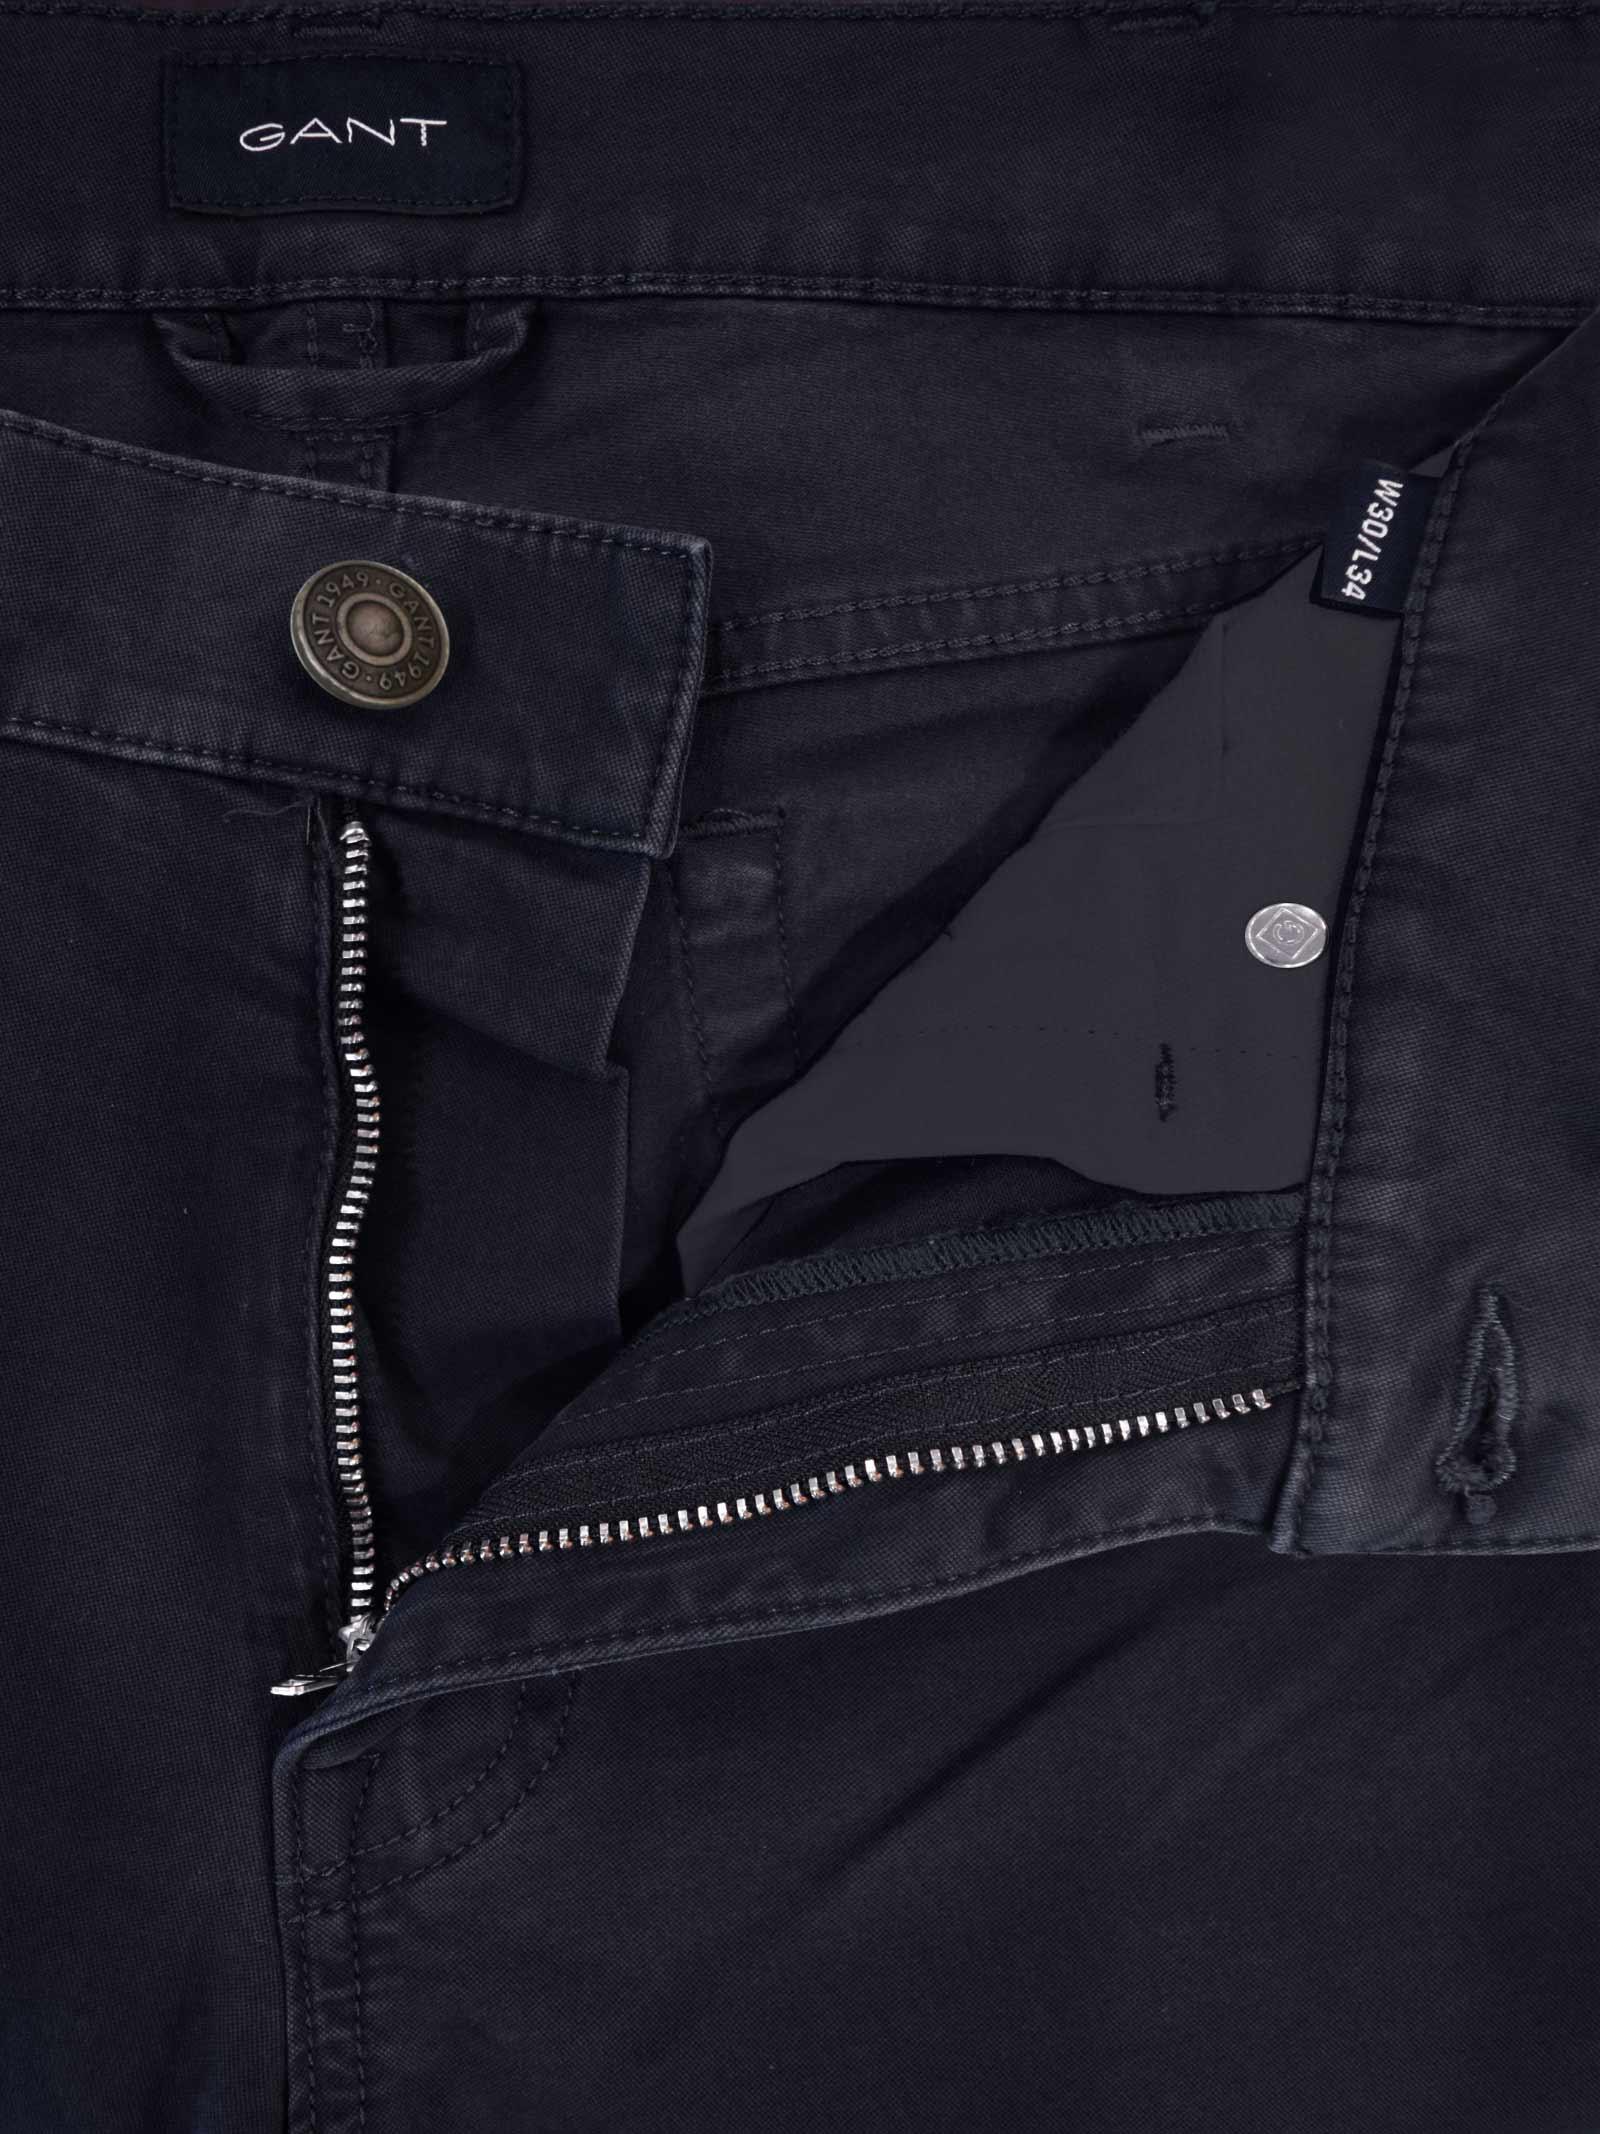 5 TASCHE COTONE GANT | Pantaloni | 1010209405